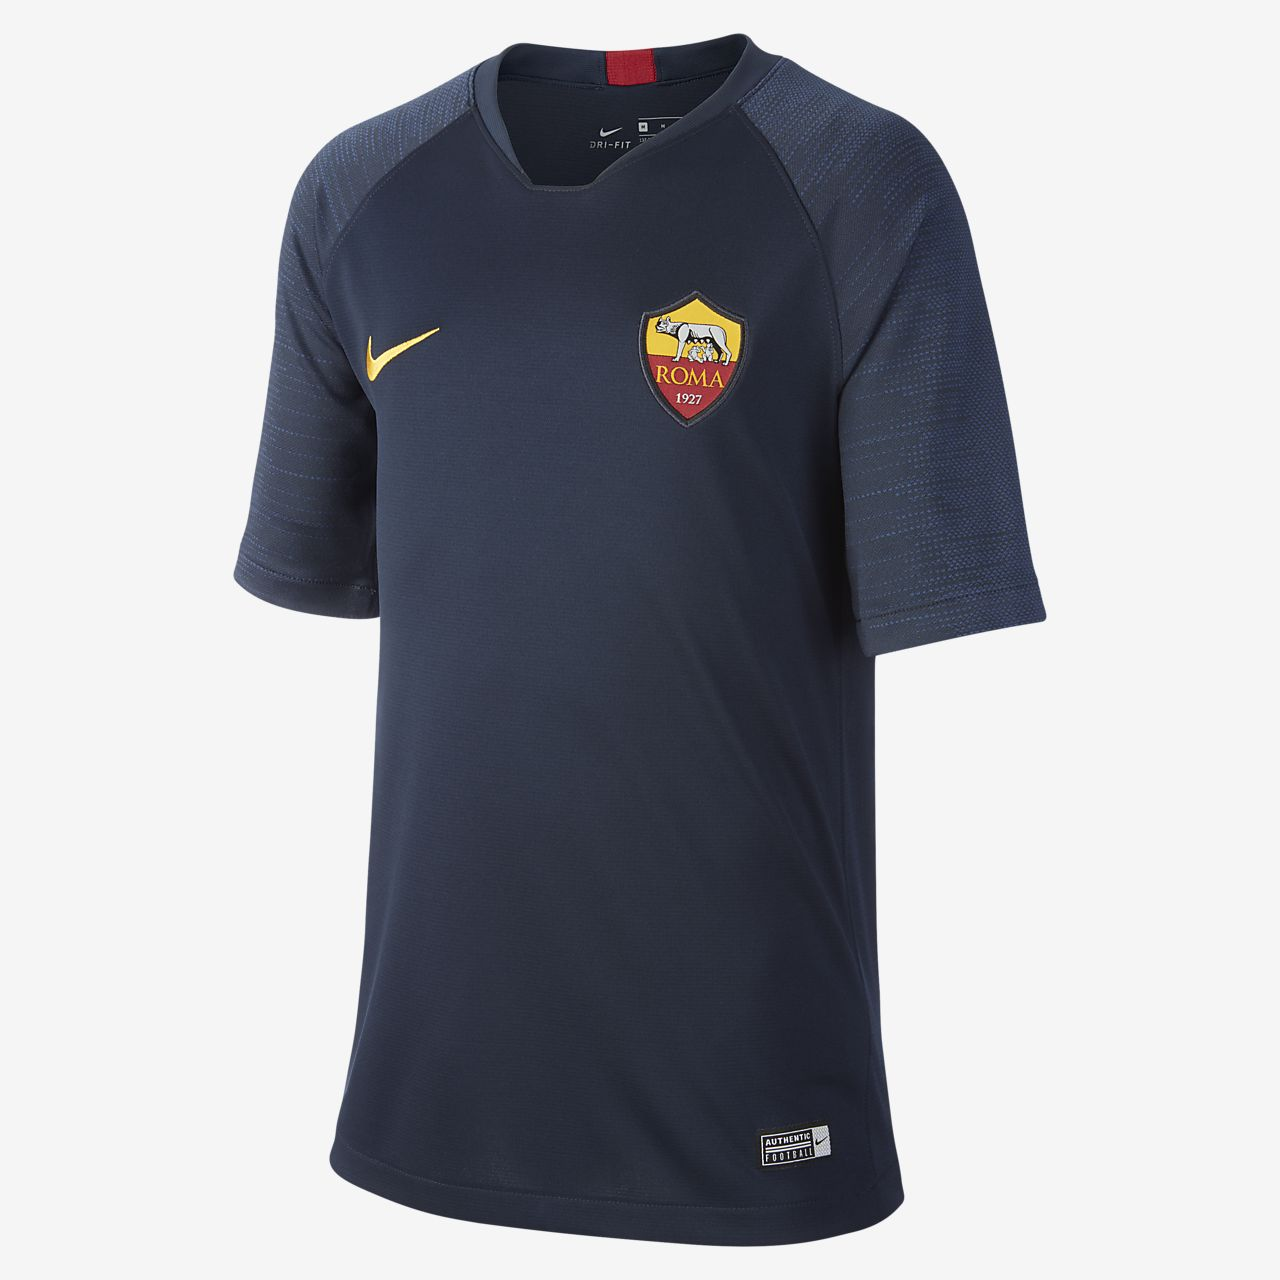 Kortärmad fotbollströja Nike Breathe A.S. Roma Strike för ungdom